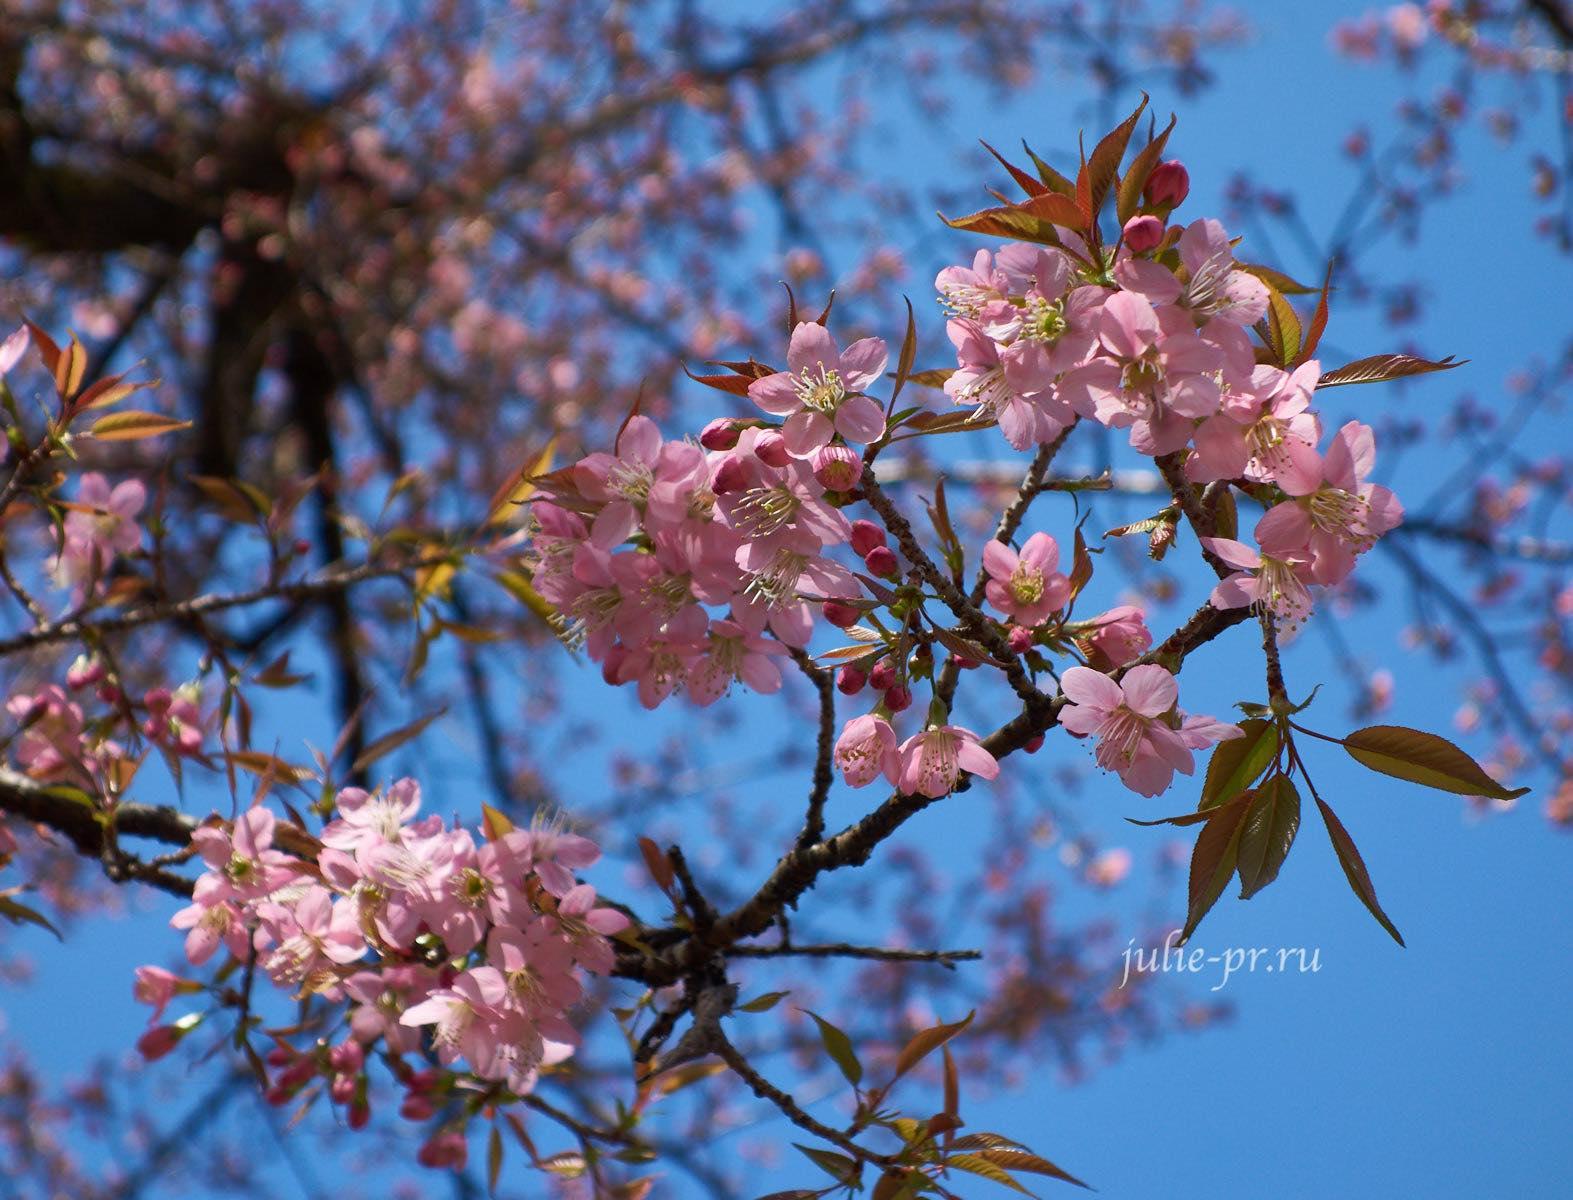 Непал, Пун-Хилл трек, Цветы